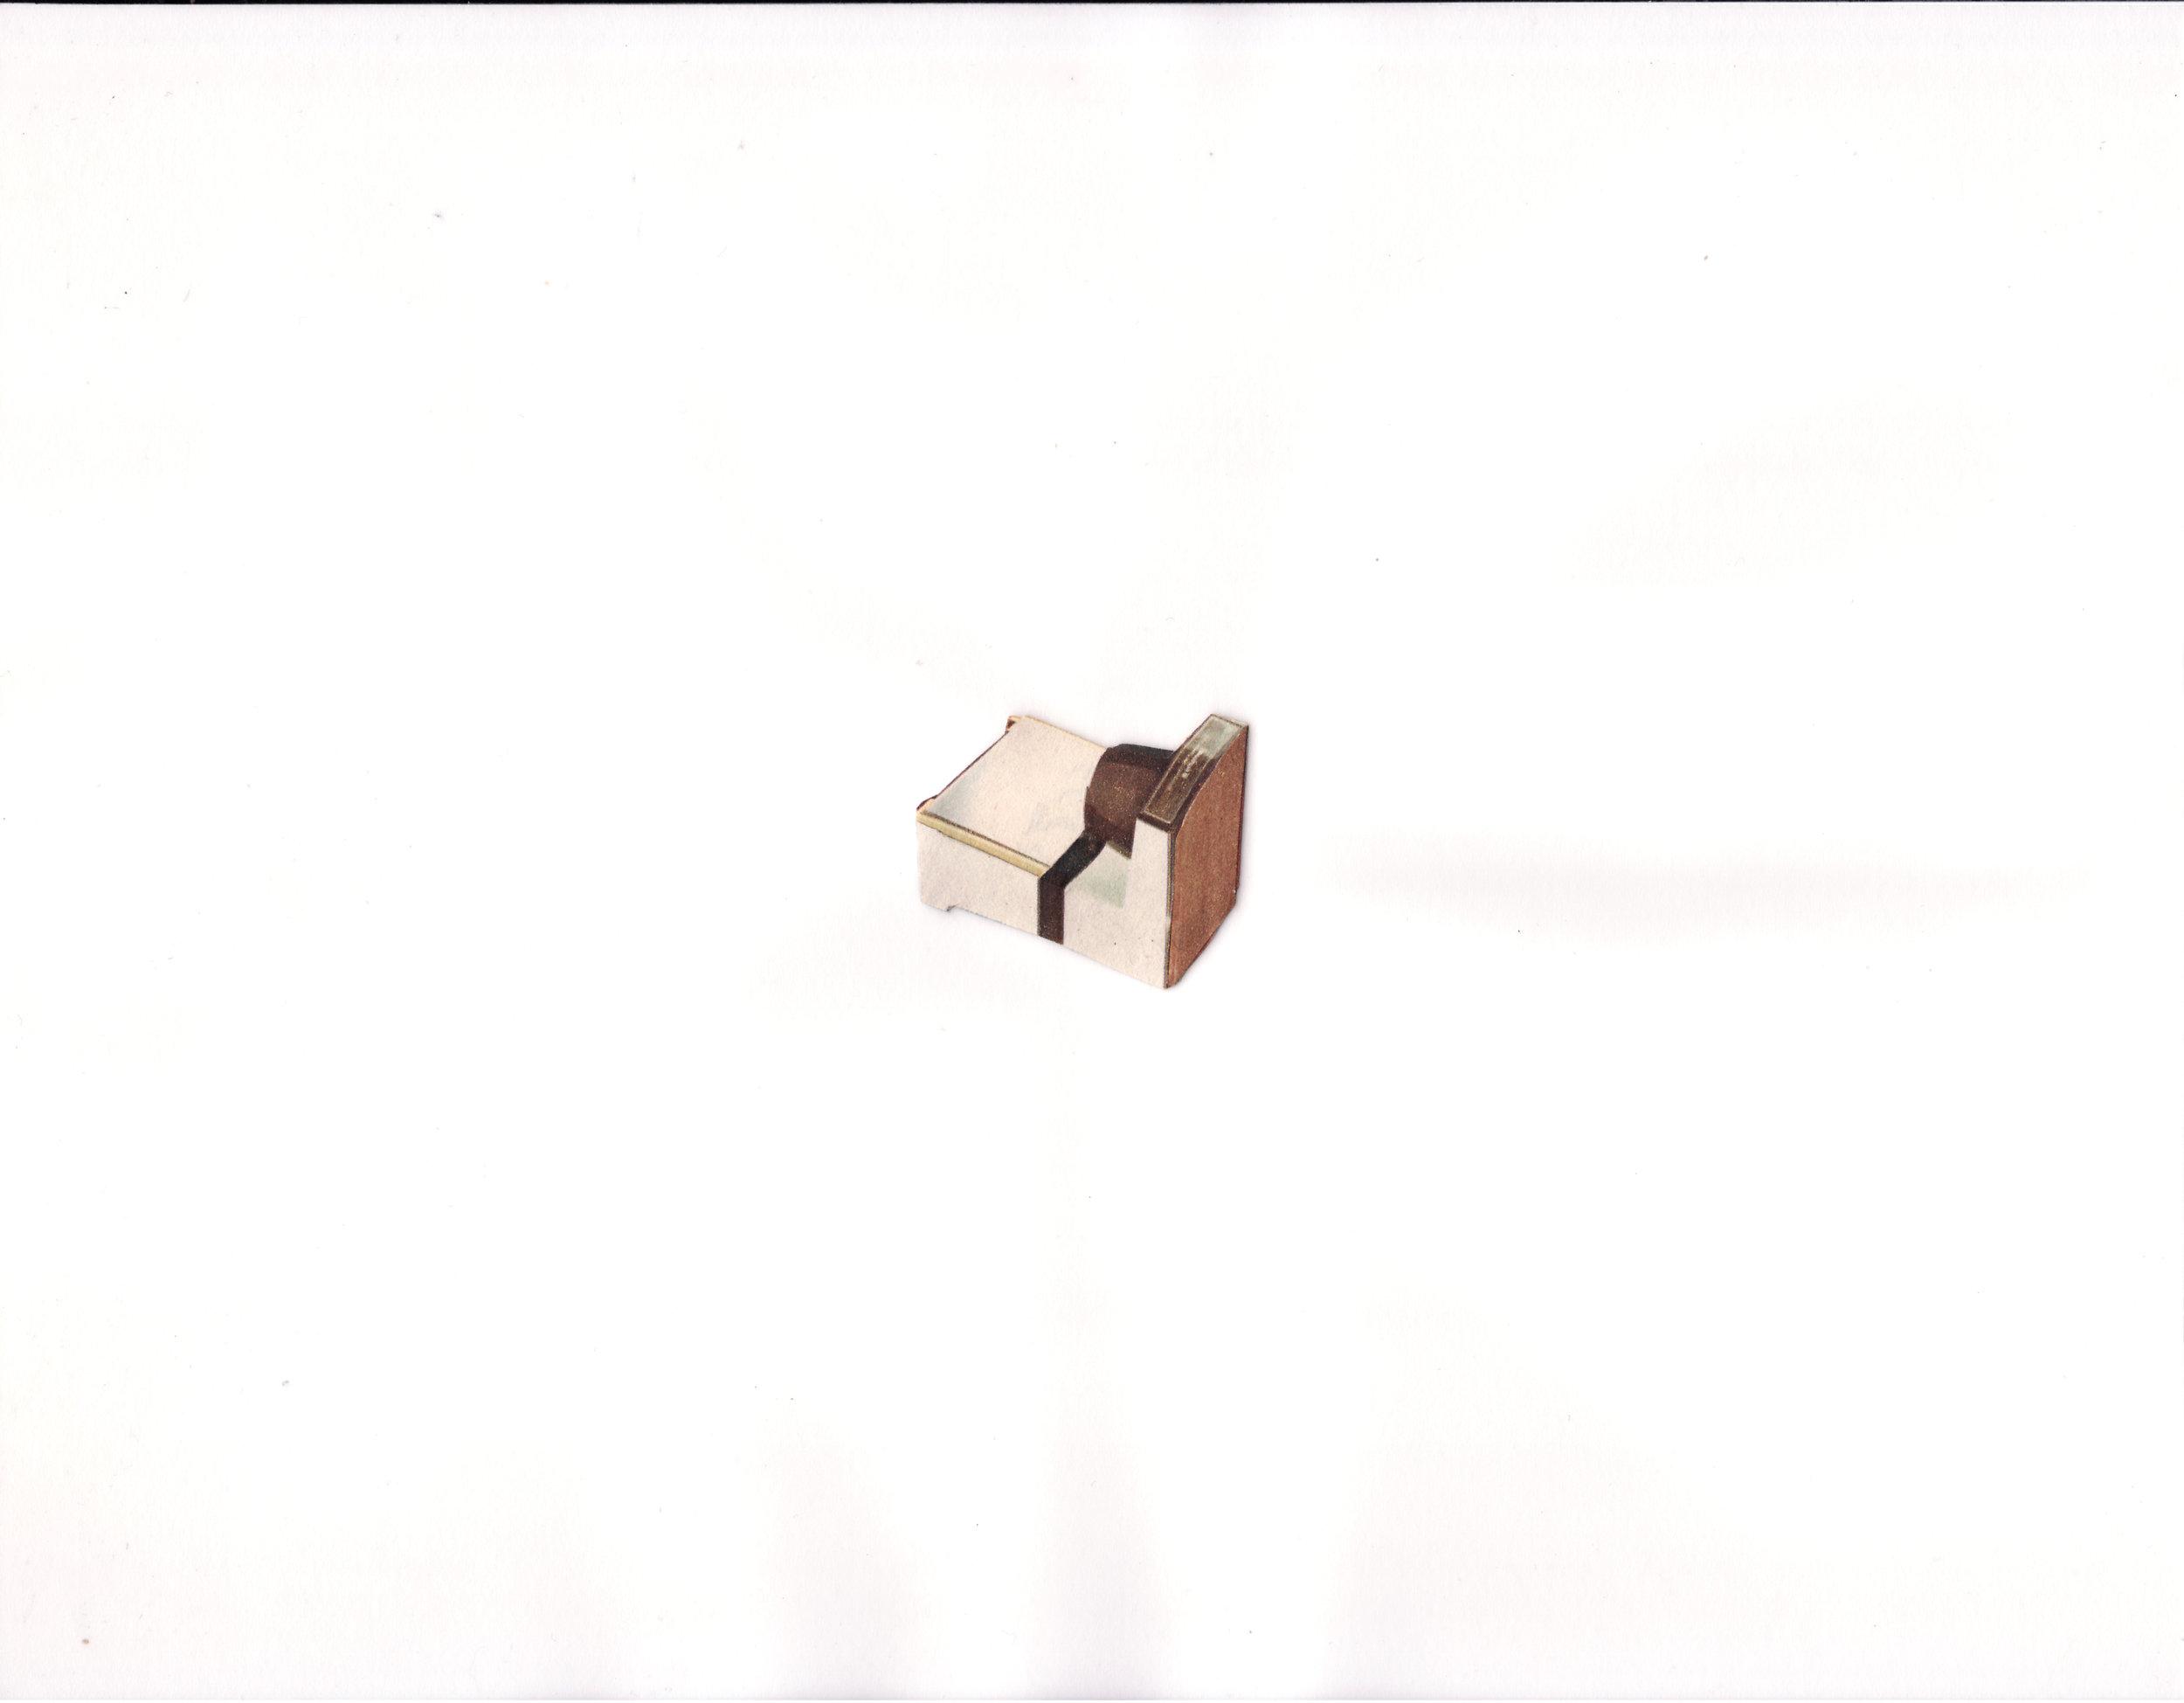 Reddimaid Object6.jpg